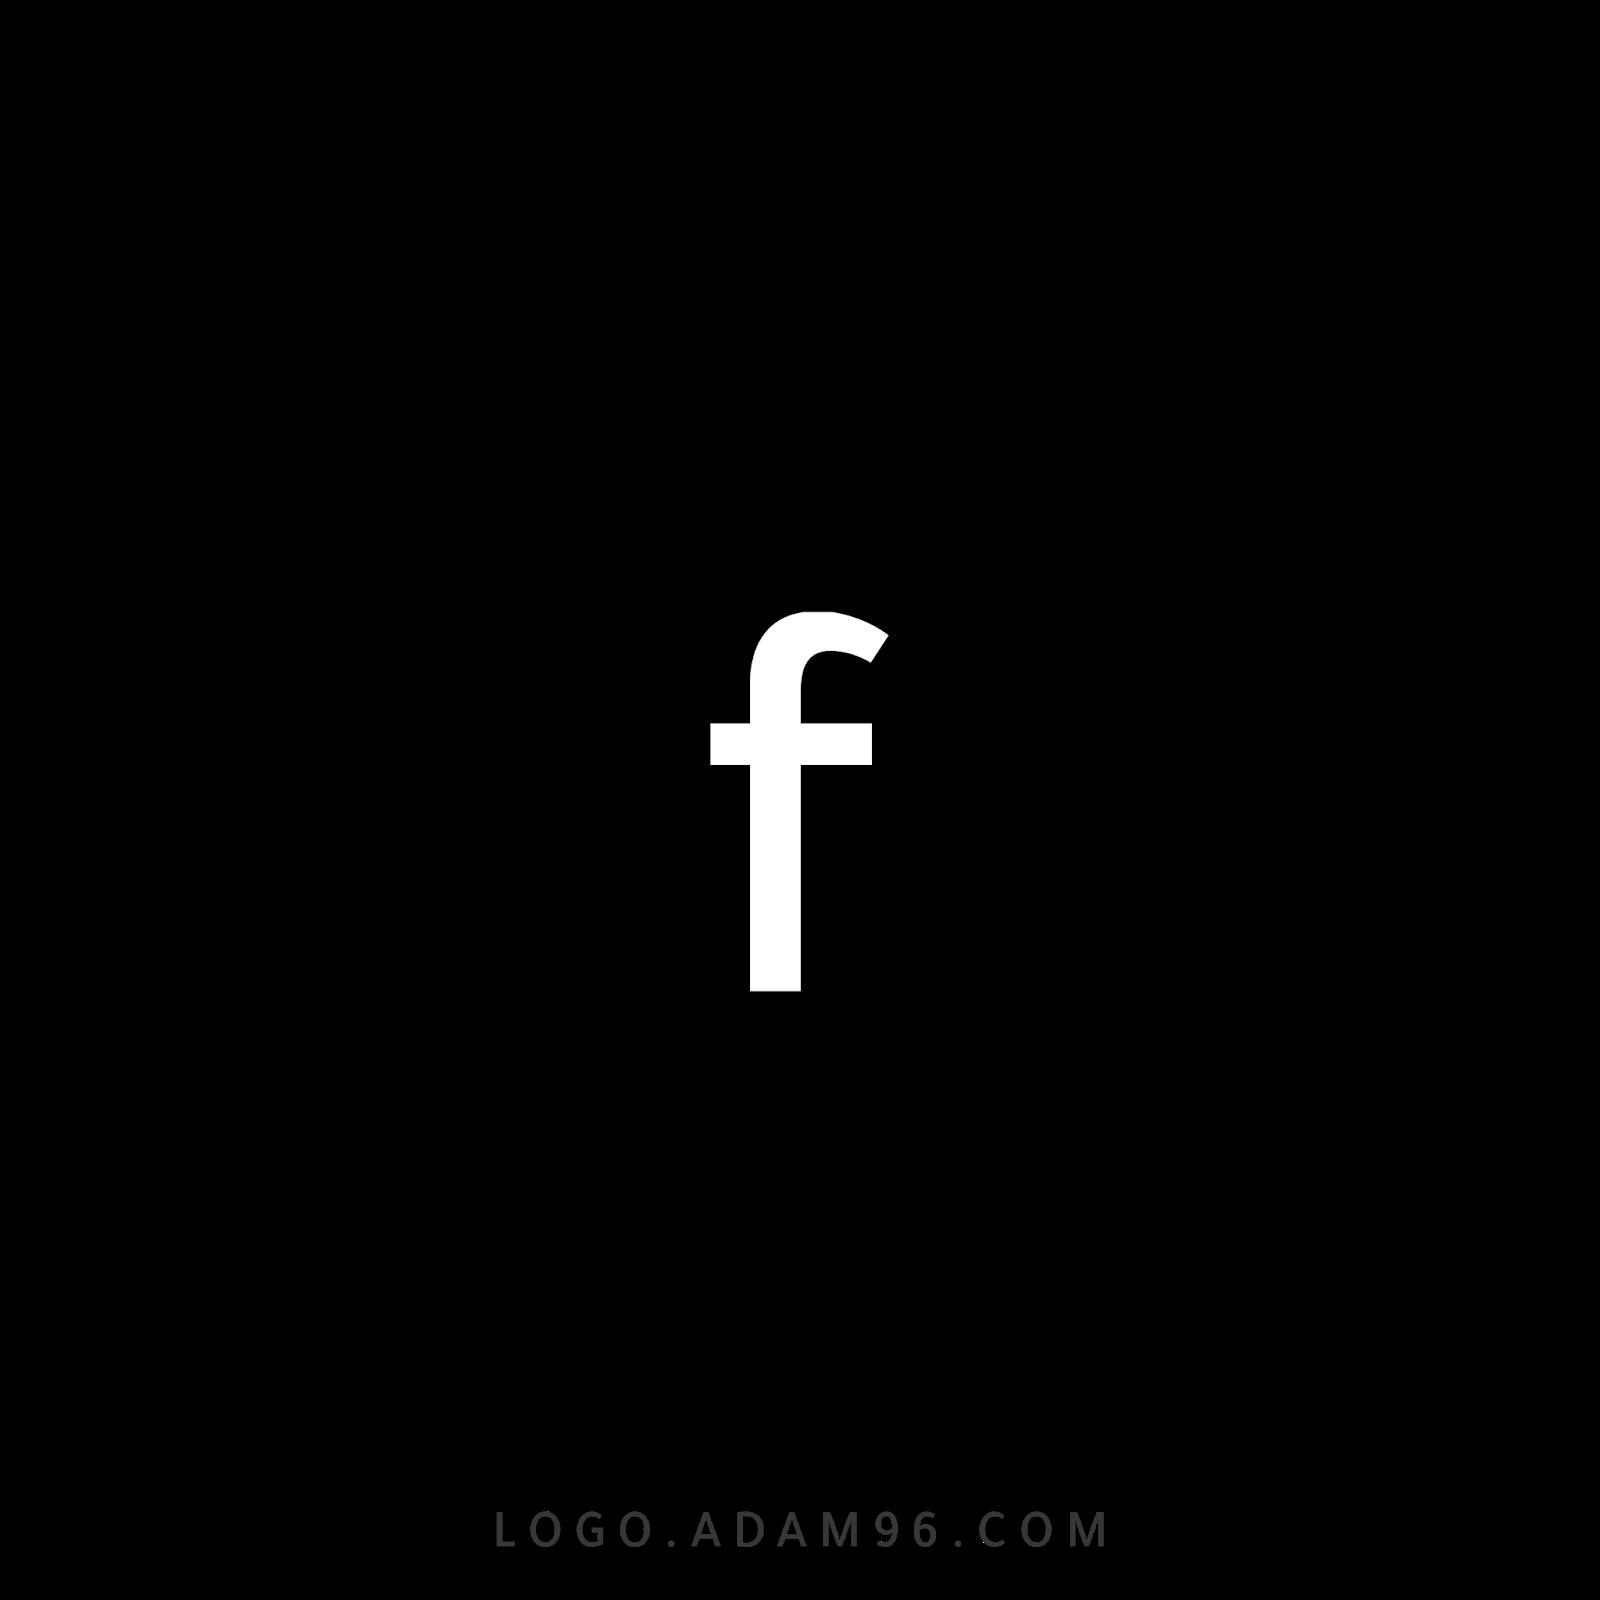 Facebook Black Logo Original Png Download Logo For Free Facebook Logo Vector Logo Facebook Facebook Logo Transparent